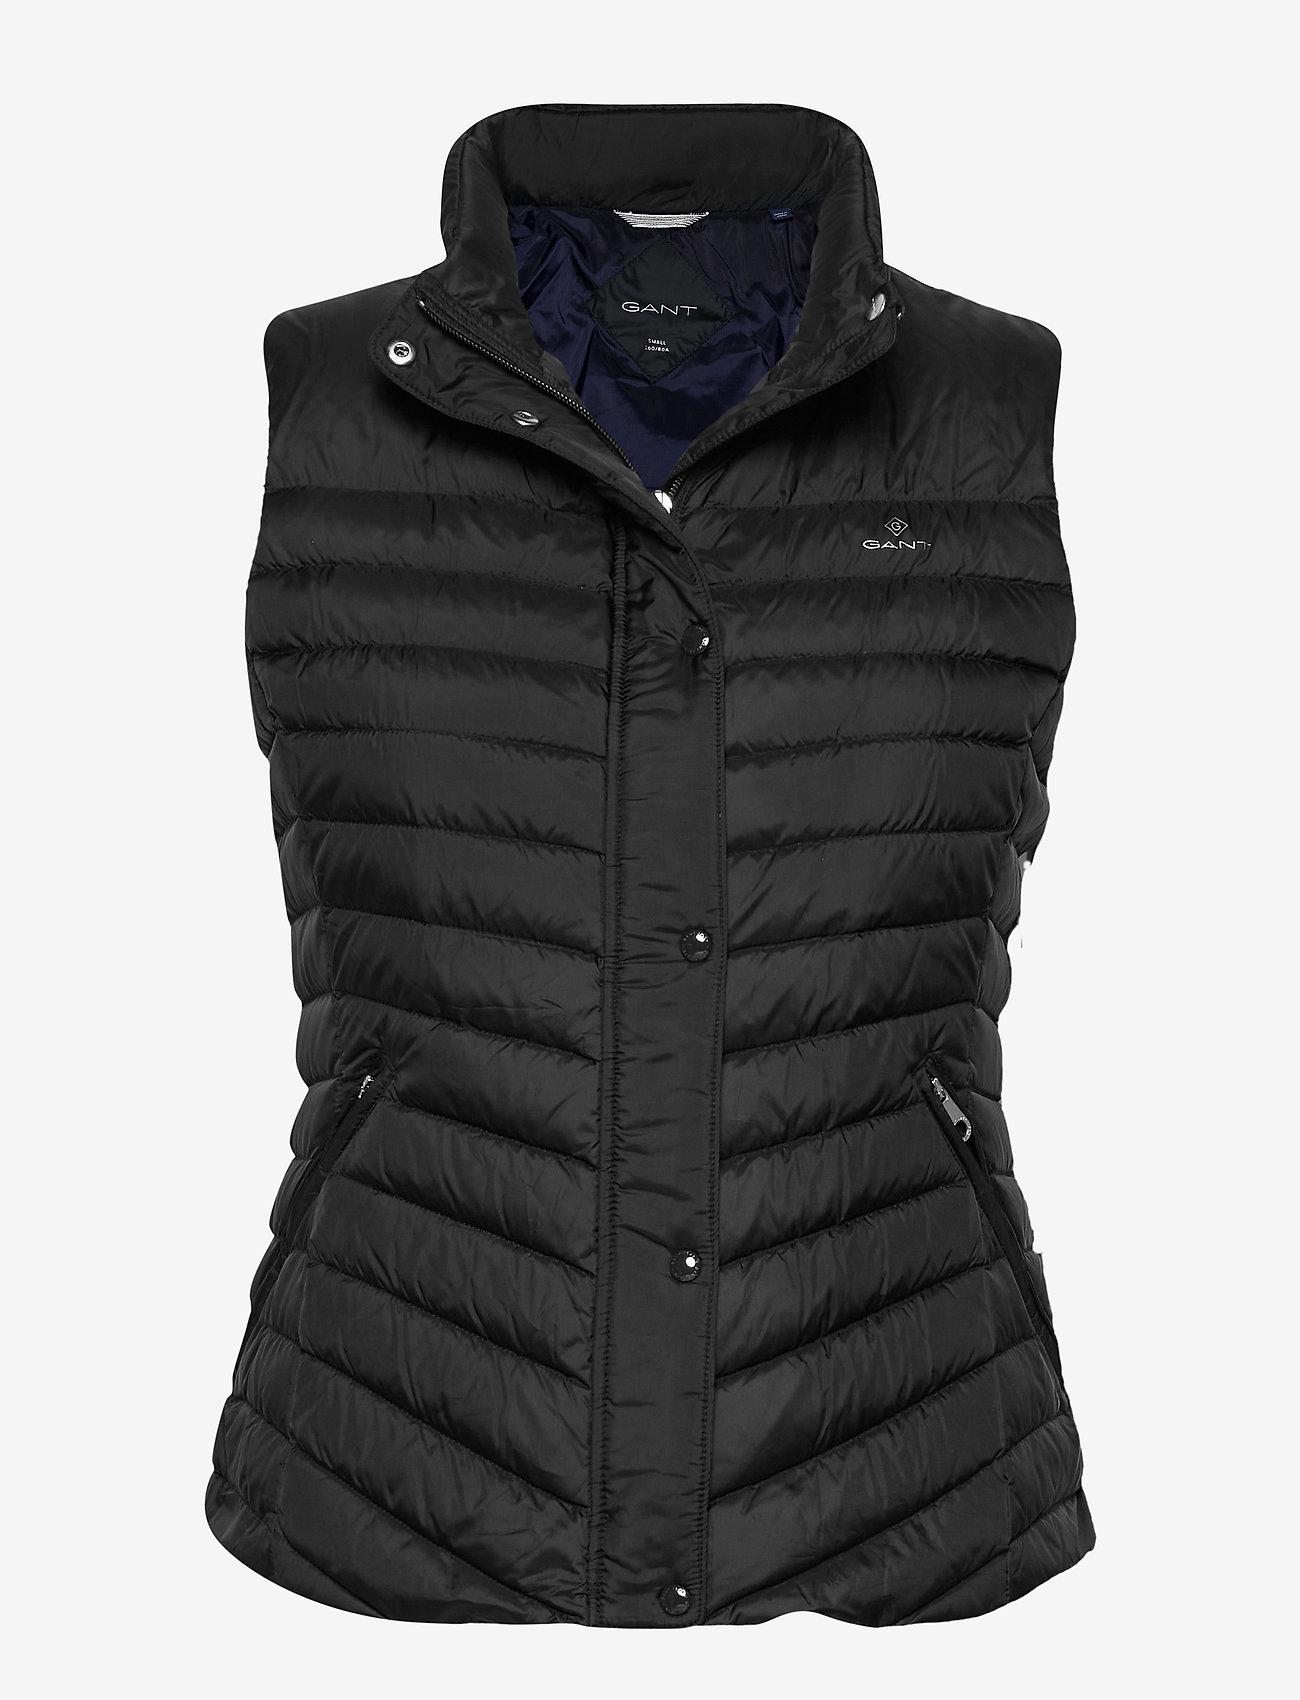 GANT - LIGHT DOWN GILET - puffer vests - black - 0